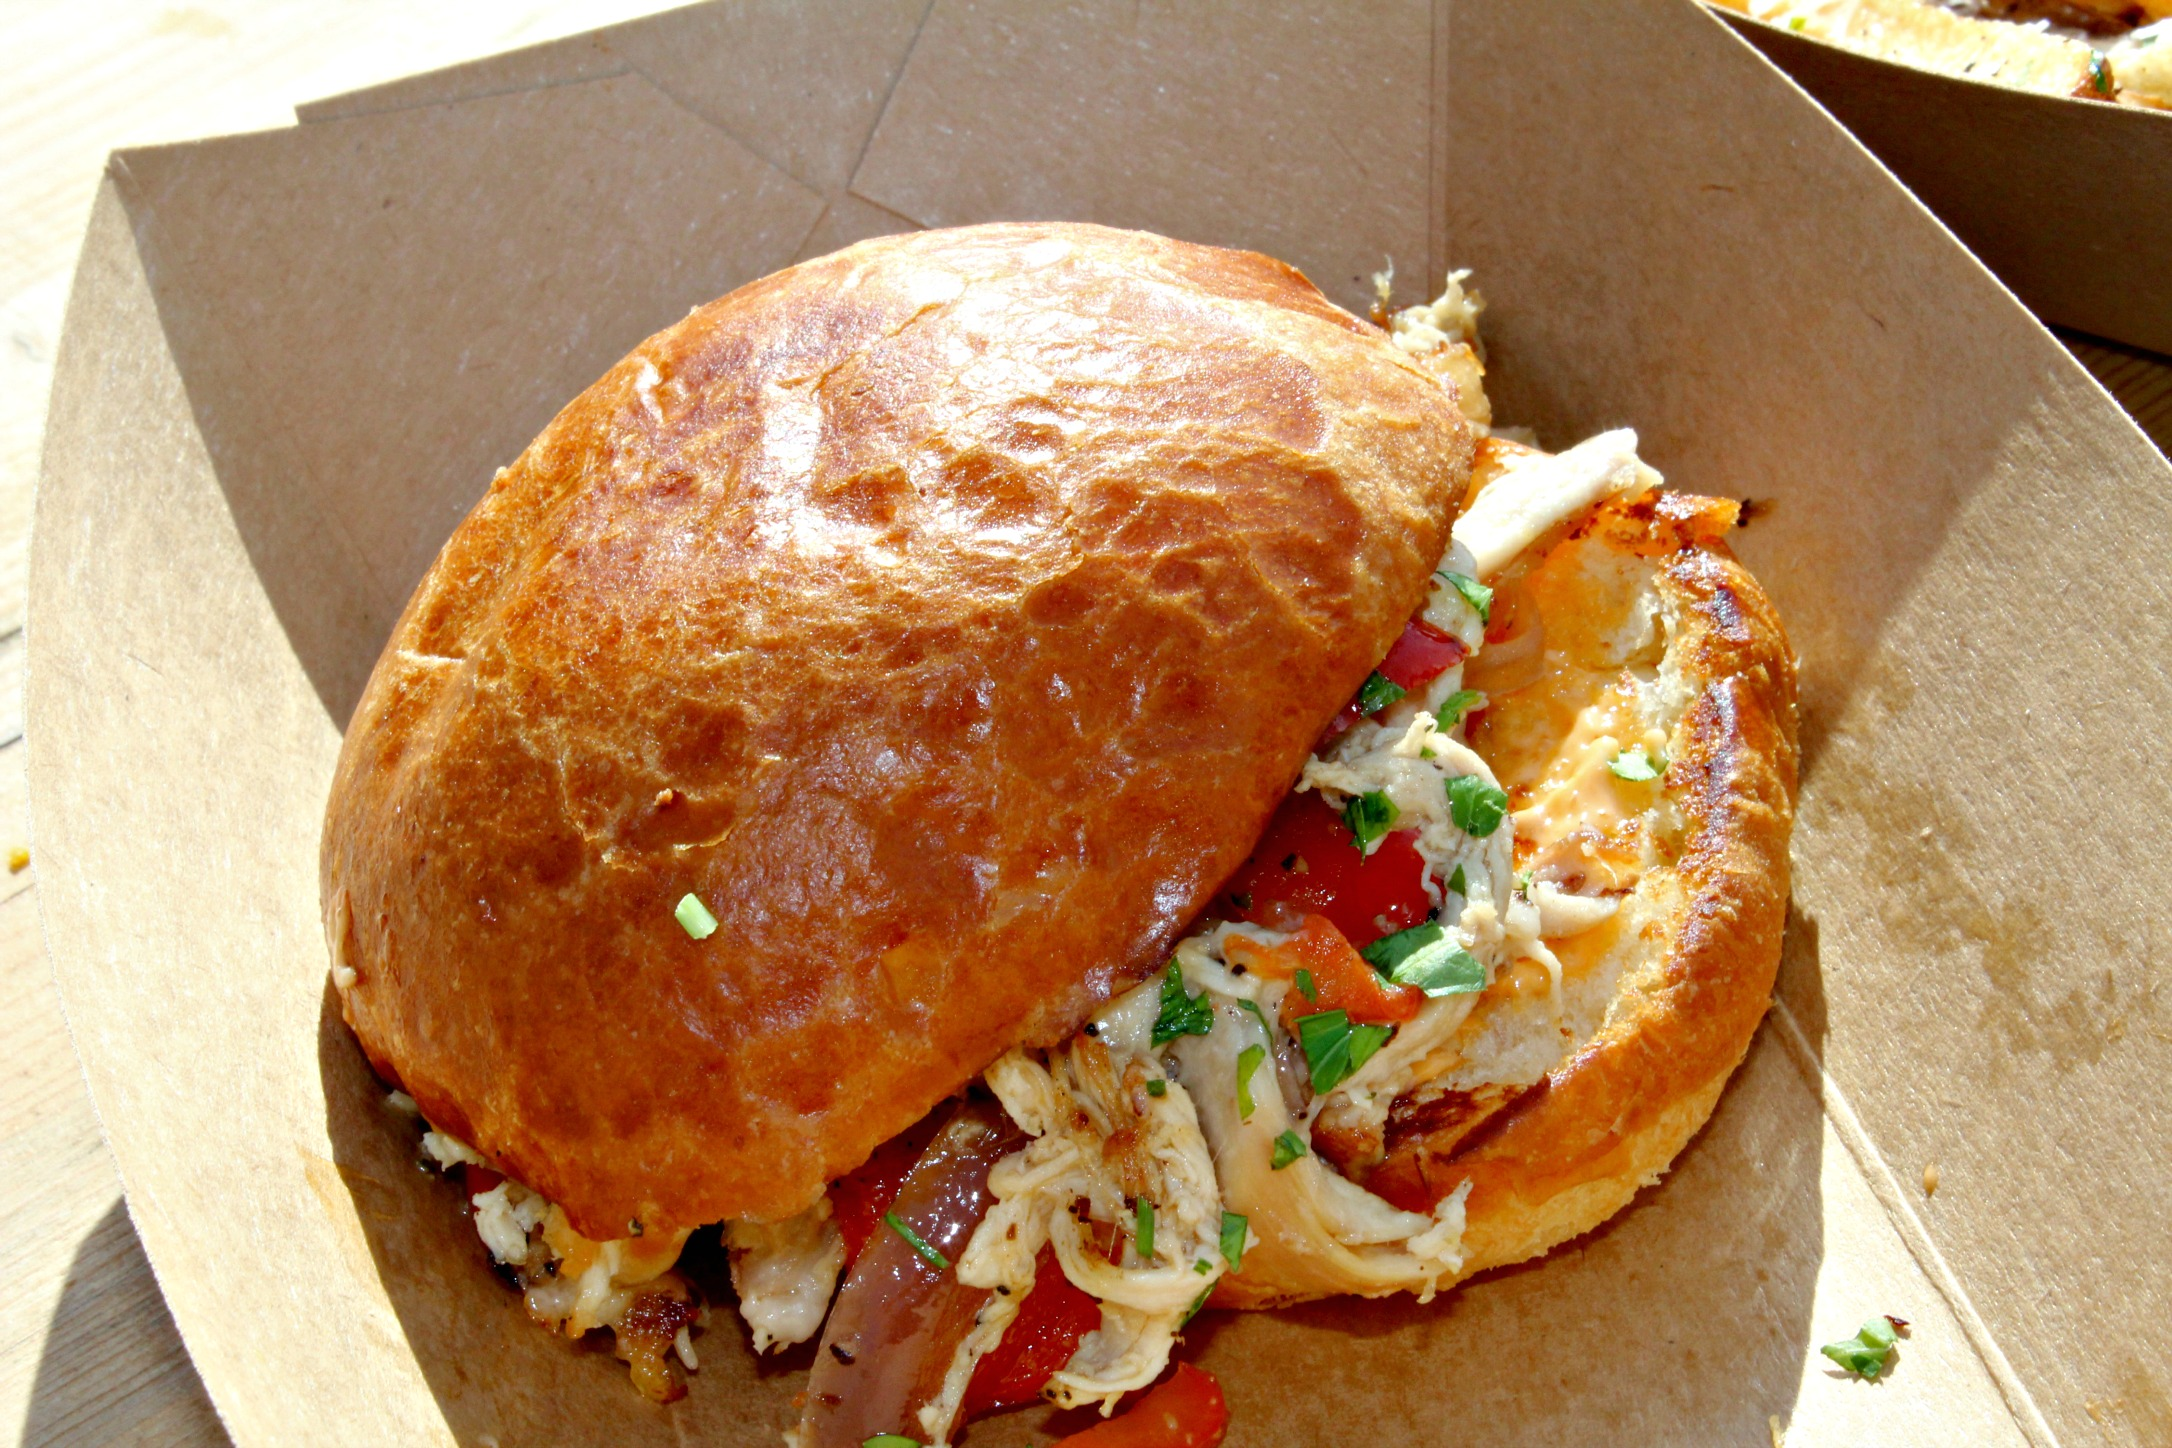 Magnolia Market Milo Food Truck Cripple Creek Chicken Sandwich